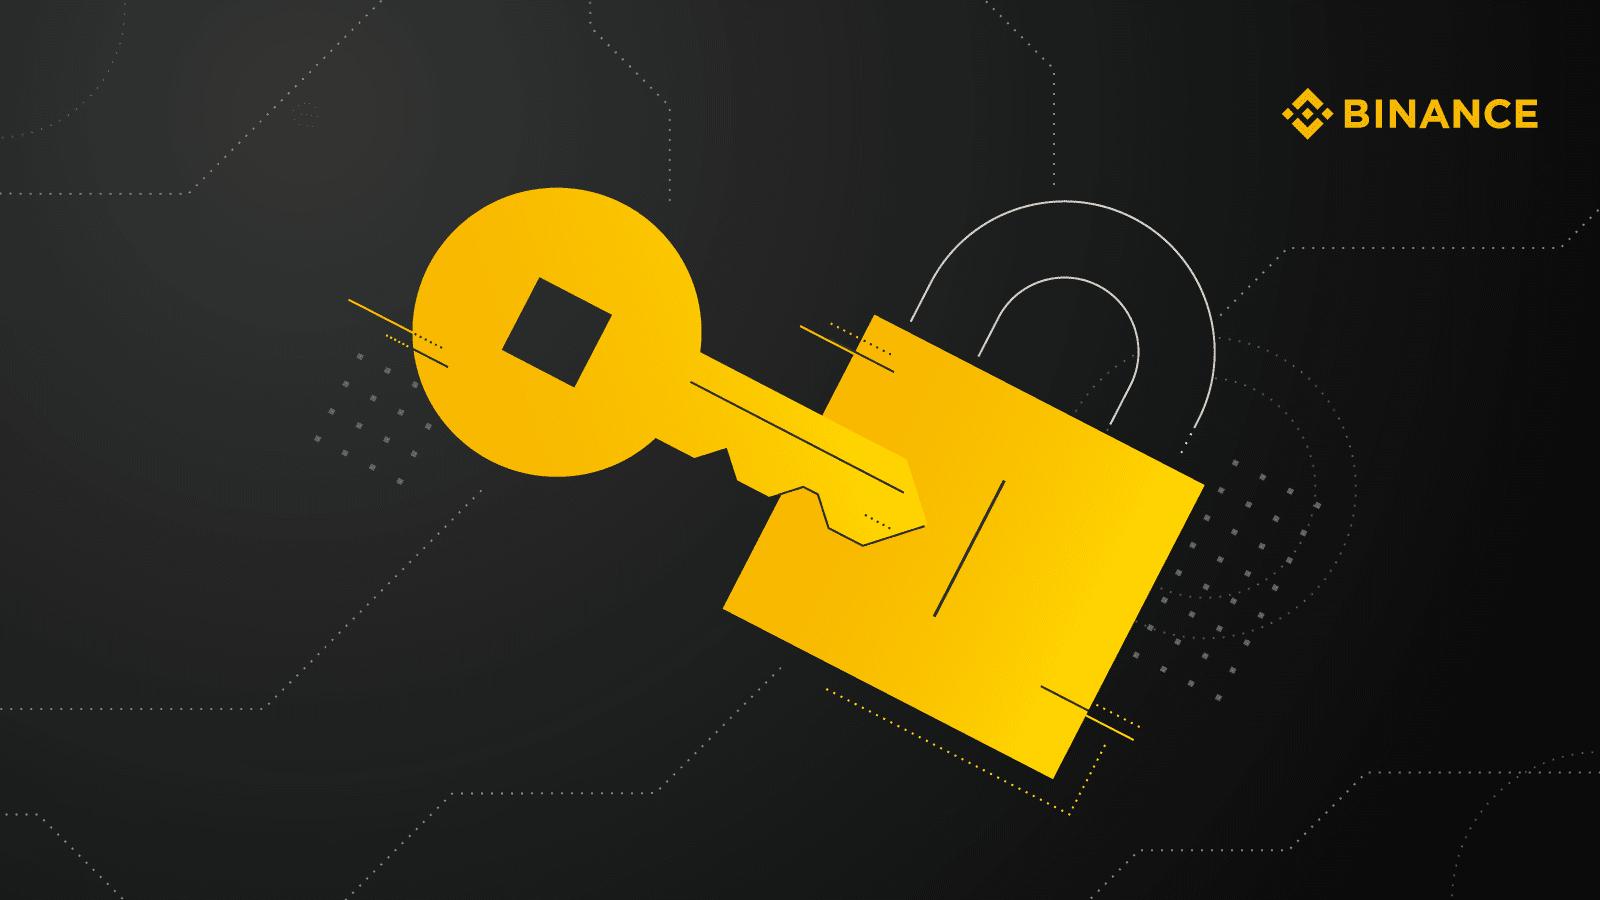 Binance Experience Security